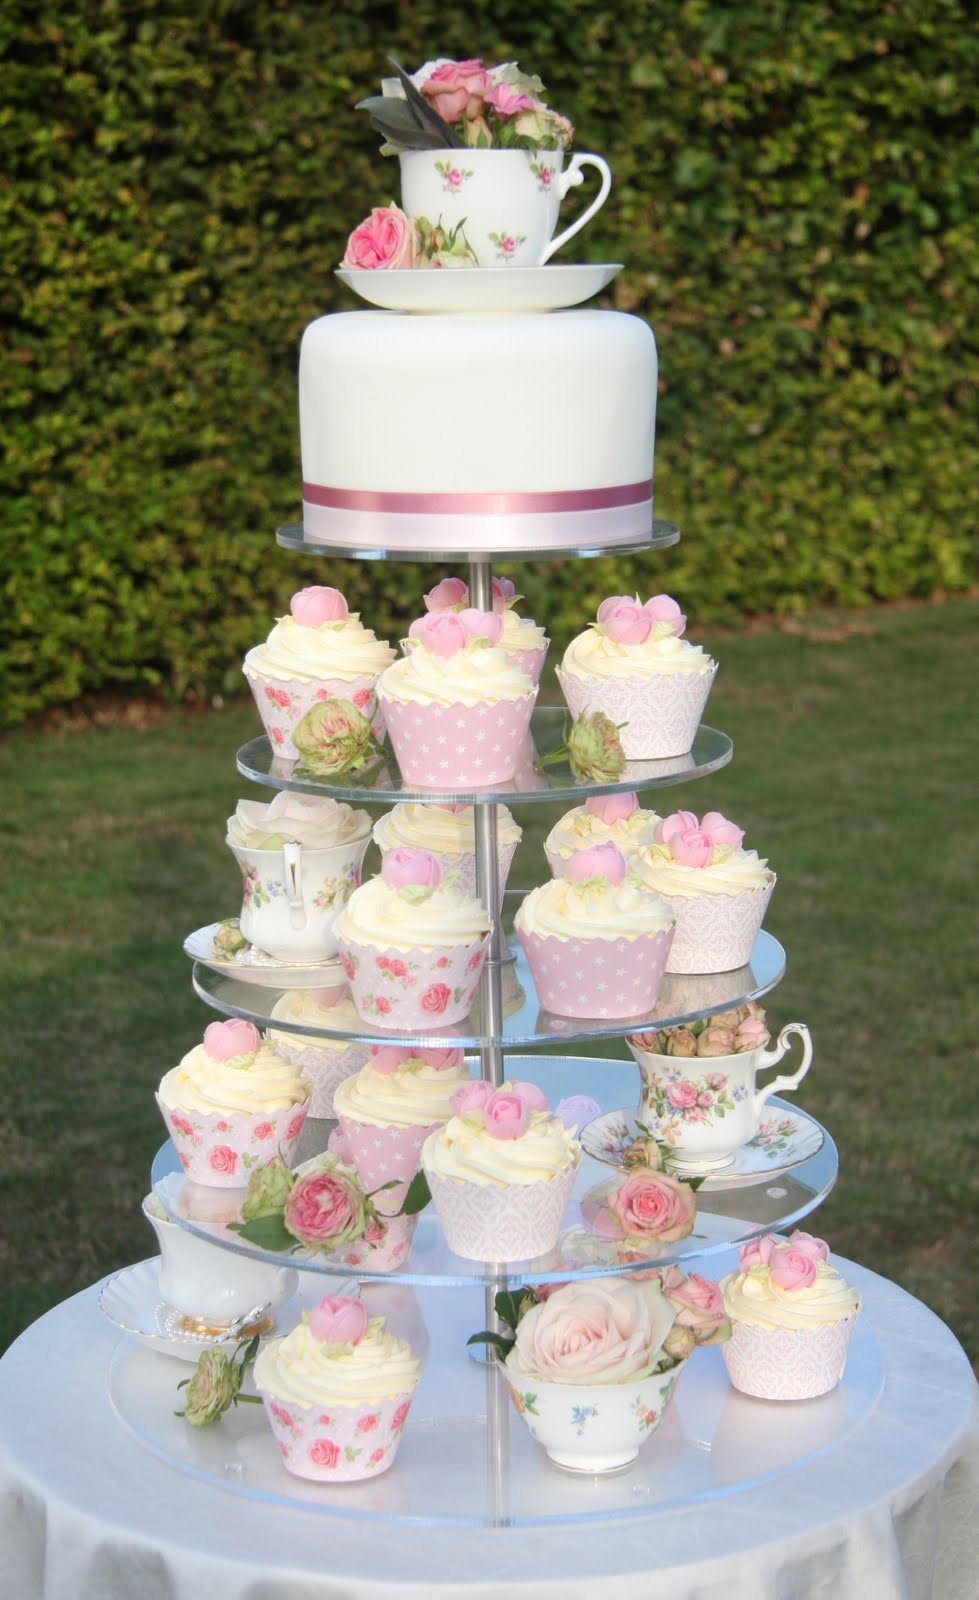 Tea+Cup+Cup+Cakes.jpg